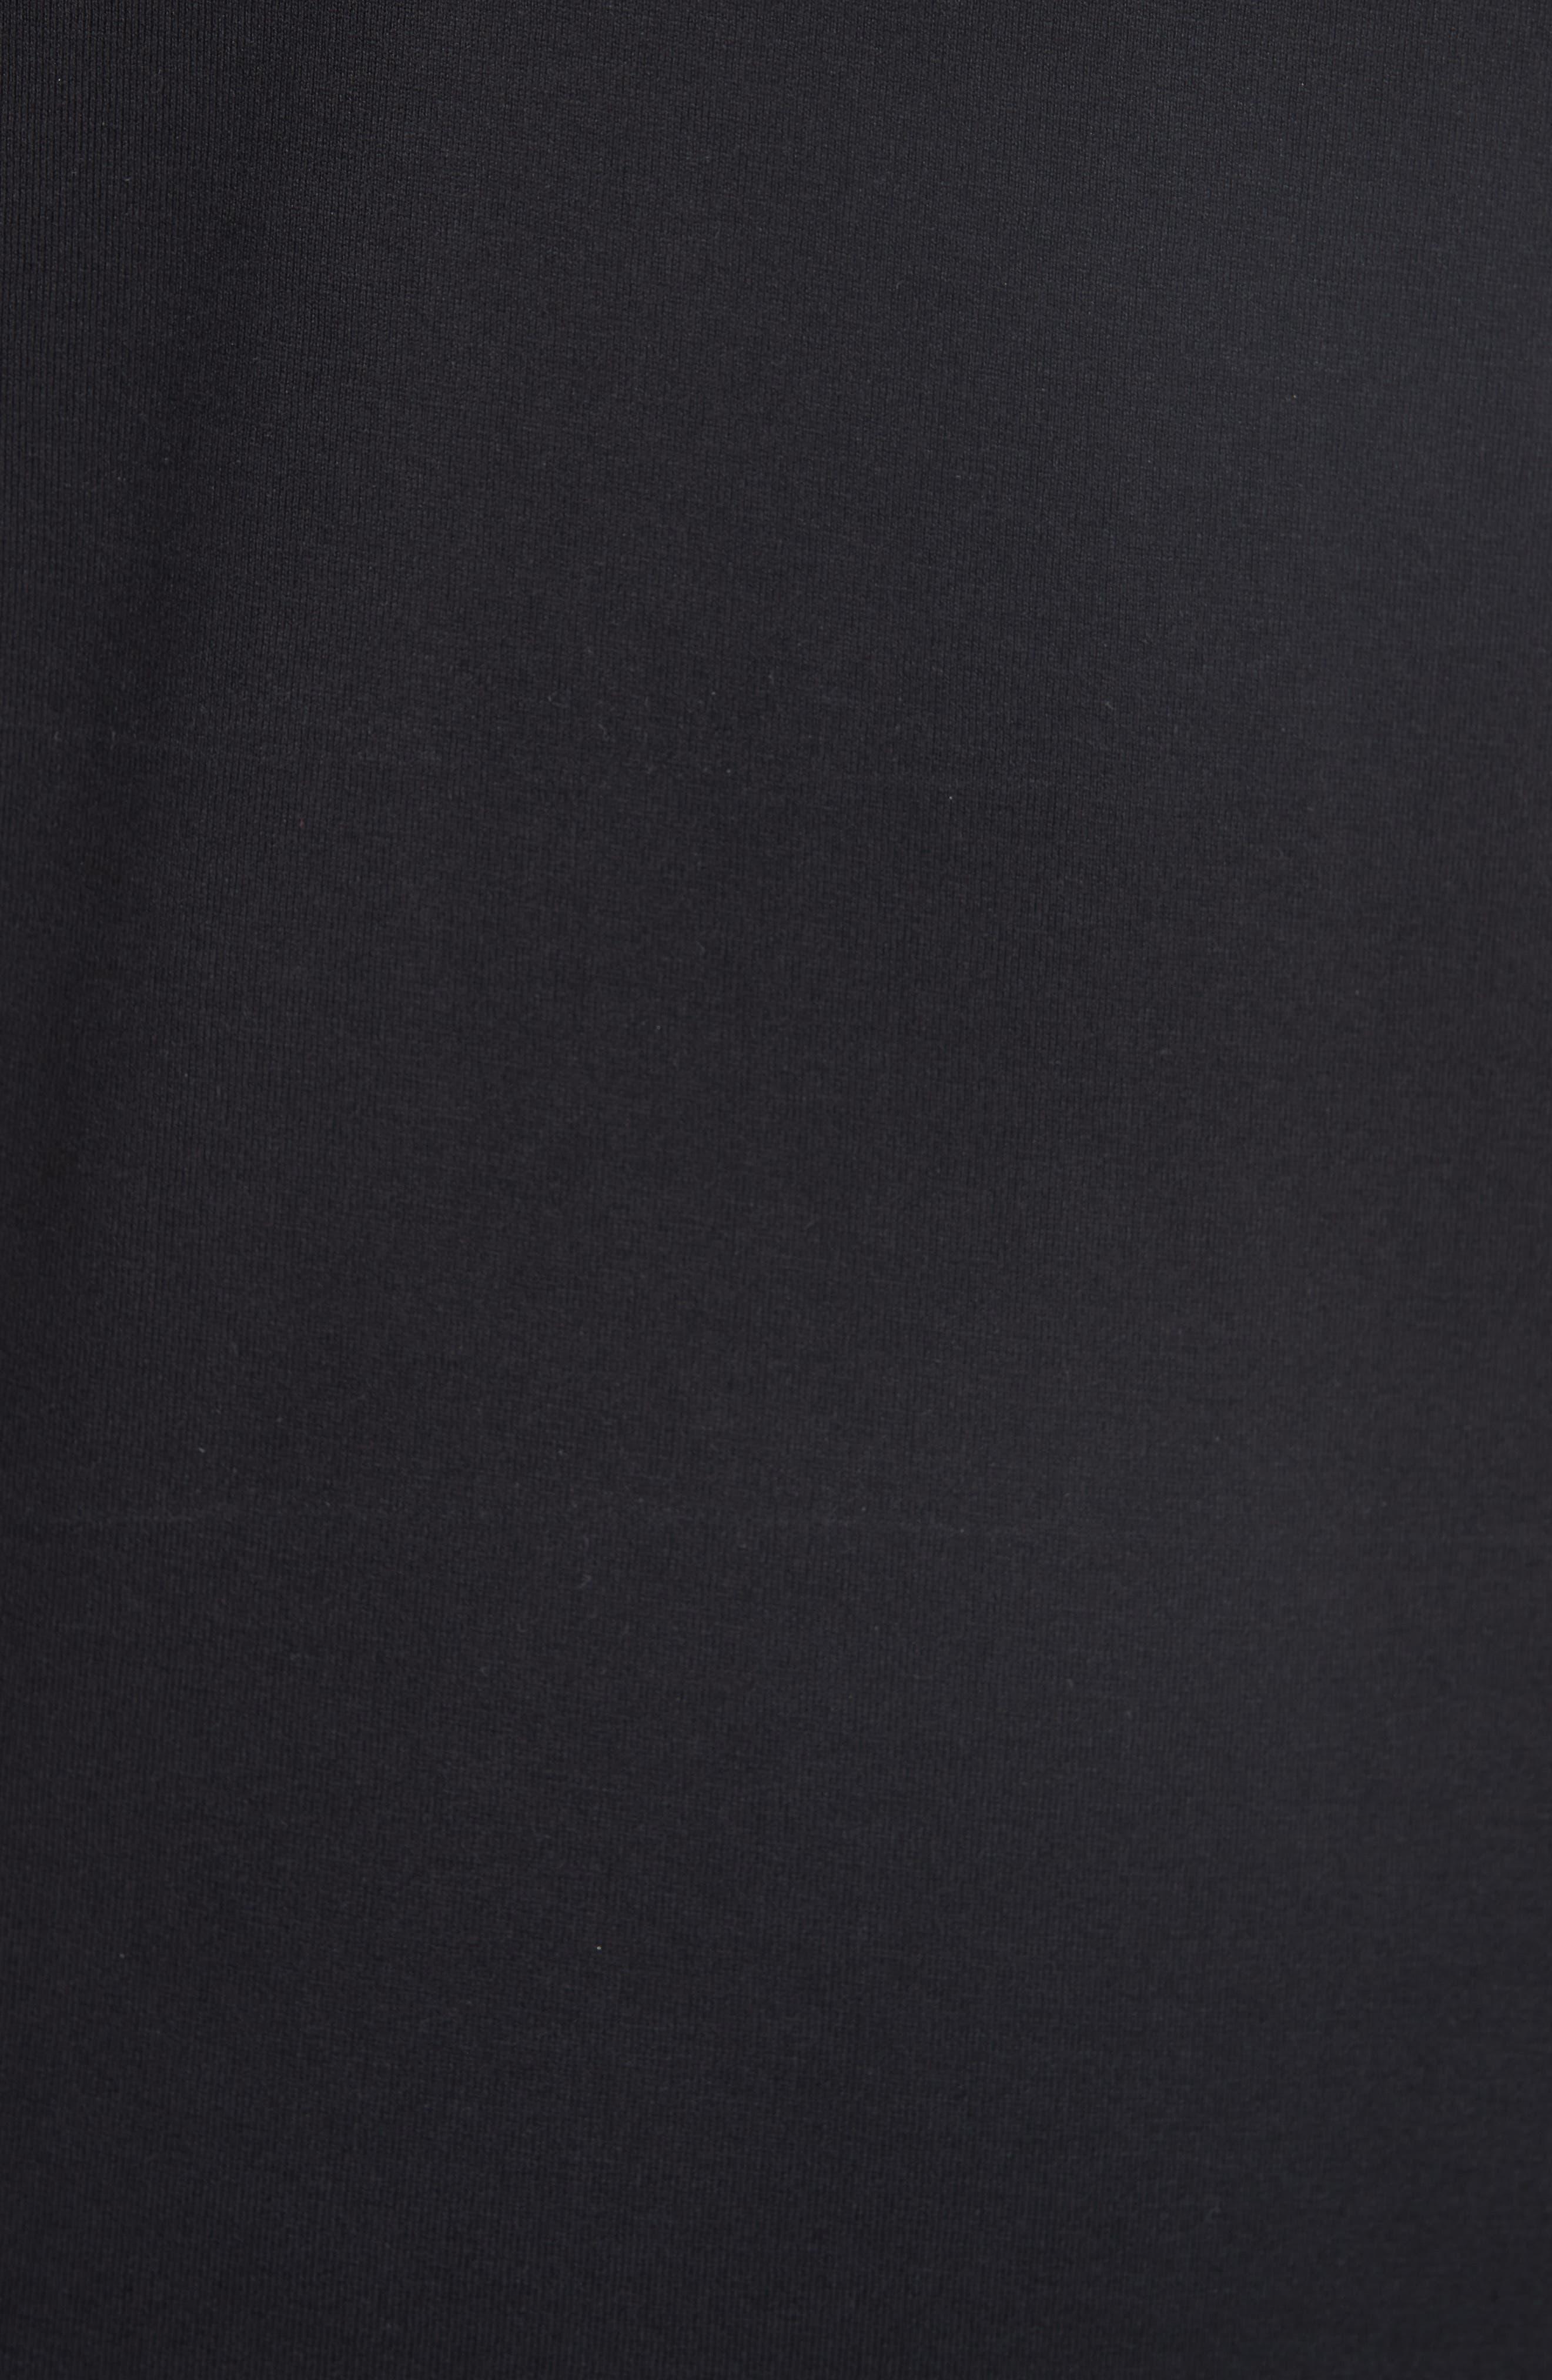 Studio 54 Graphic T-Shirt,                             Alternate thumbnail 5, color,                             001